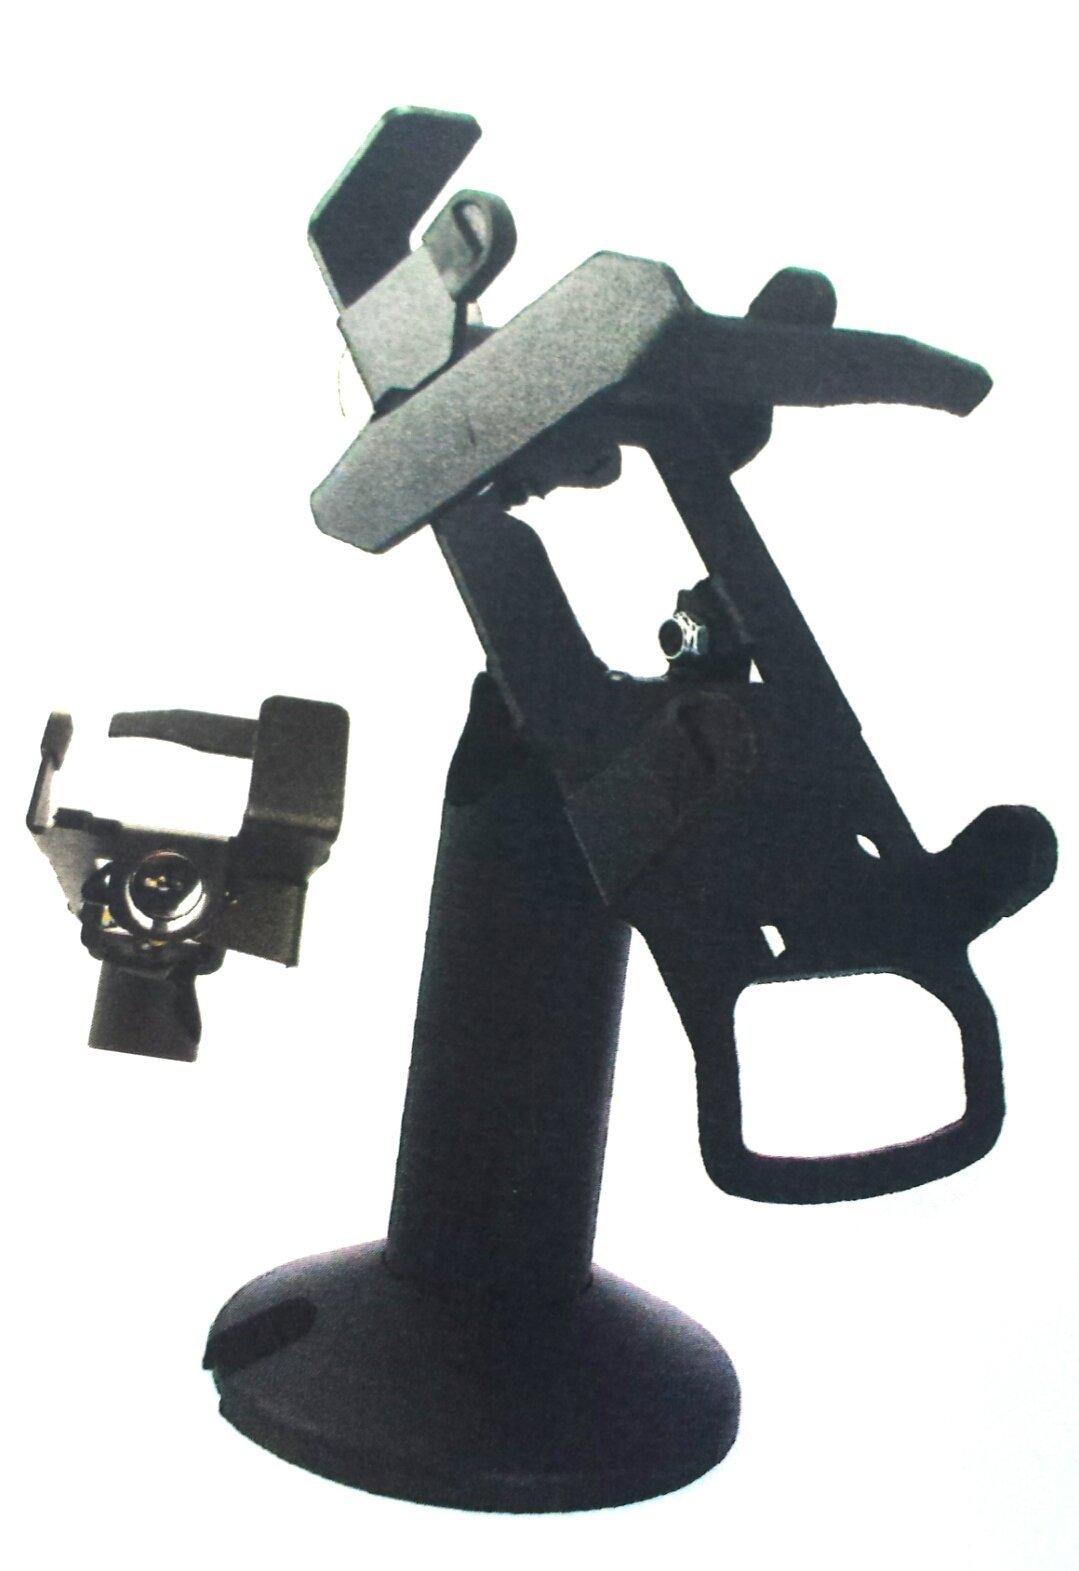 Verifone Vx805 & 820 Swivel & Tilt Lock Stand